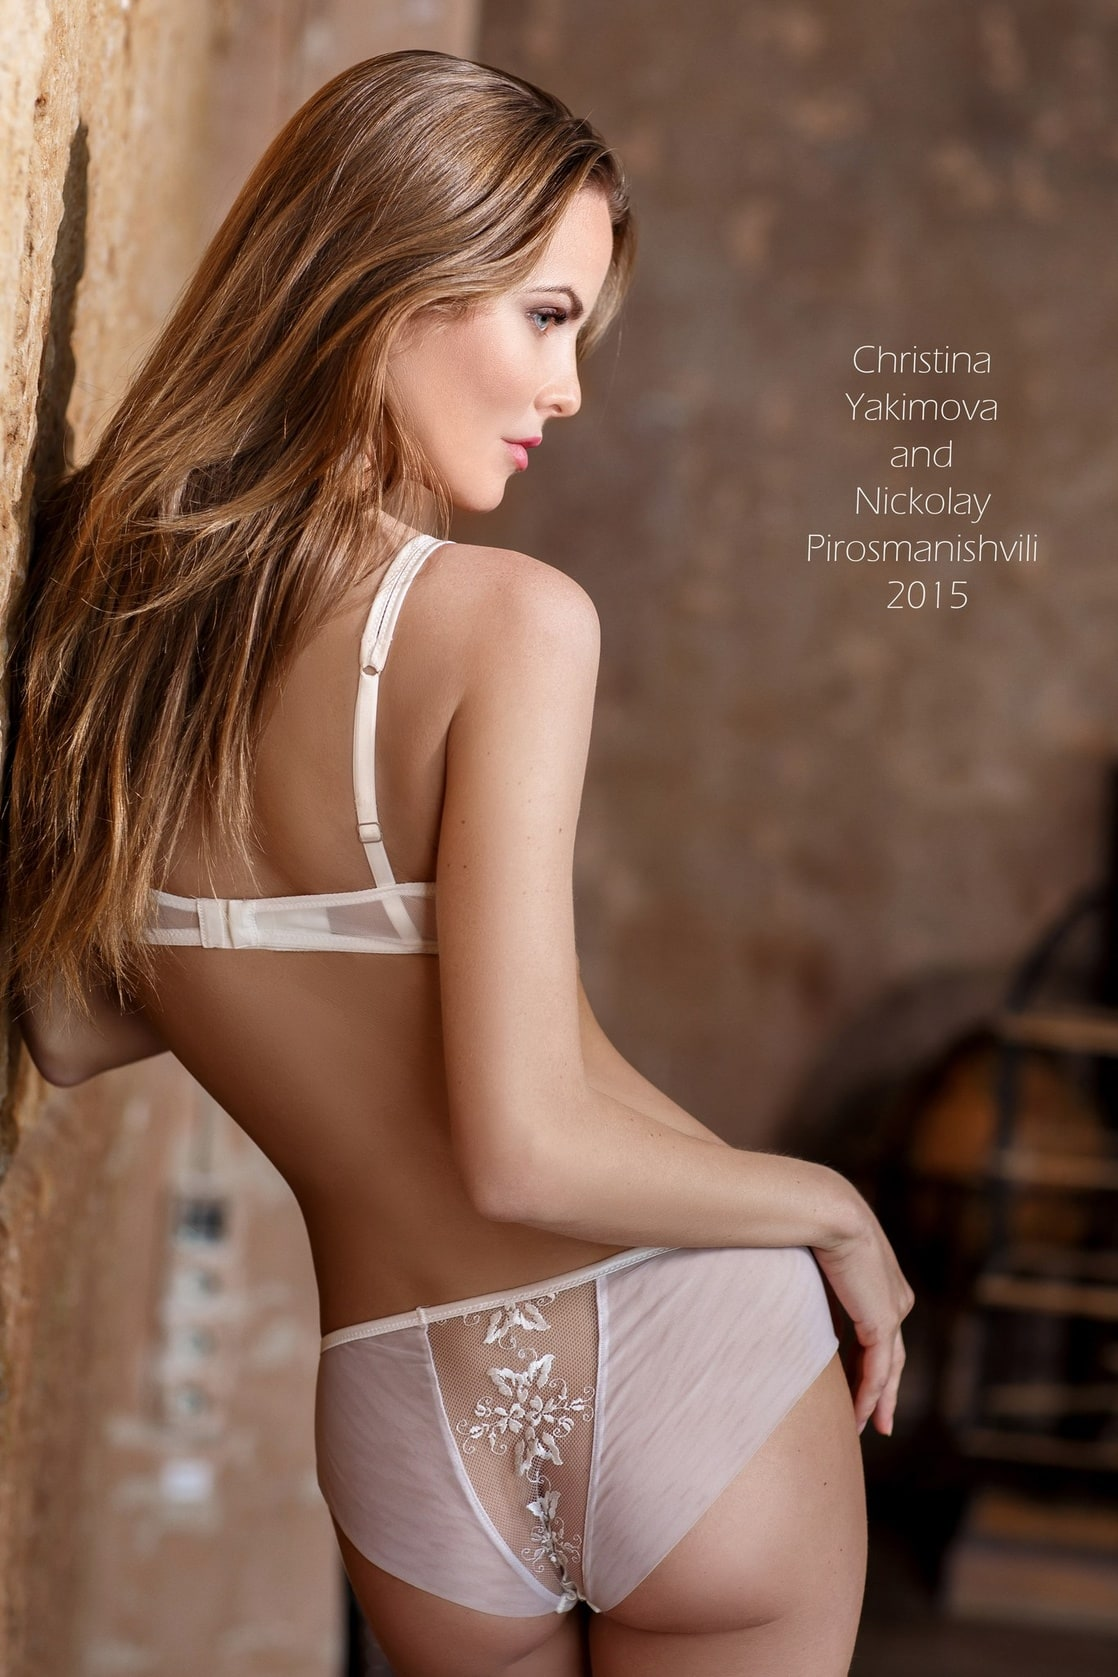 Bikini Kristina Yakimova  nudes (31 fotos), Snapchat, bra